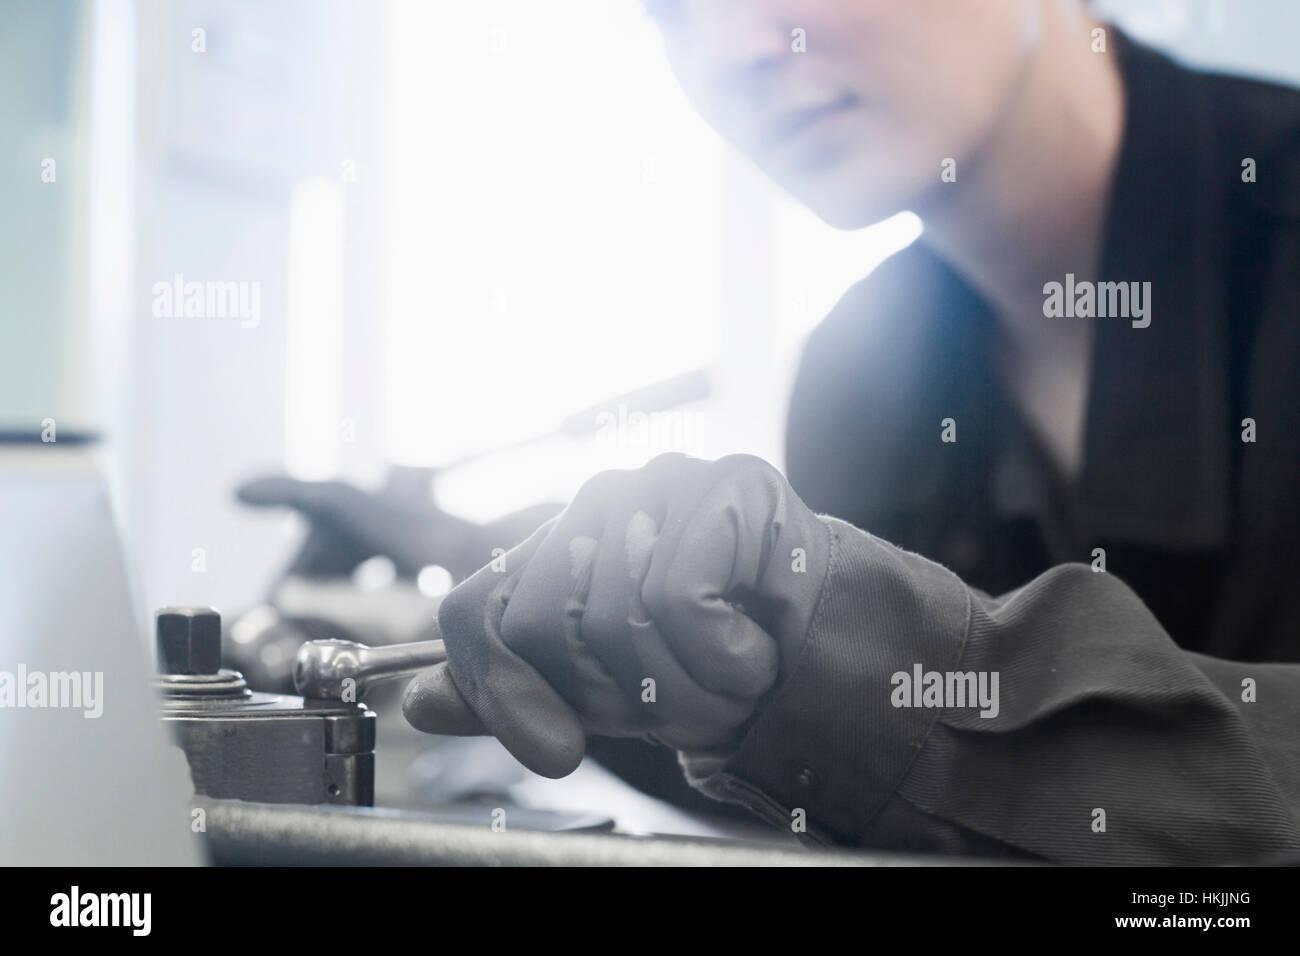 Female engineer in workshop with a lever in hand, Freiburg im Breisgau, Baden-Württemberg, Germany - Stock Image